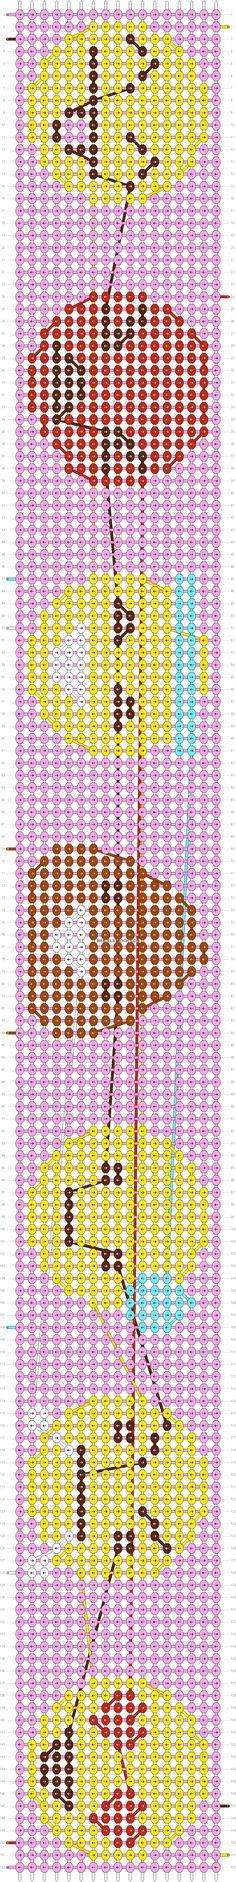 Alpha Pattern #21559 added by zdunich